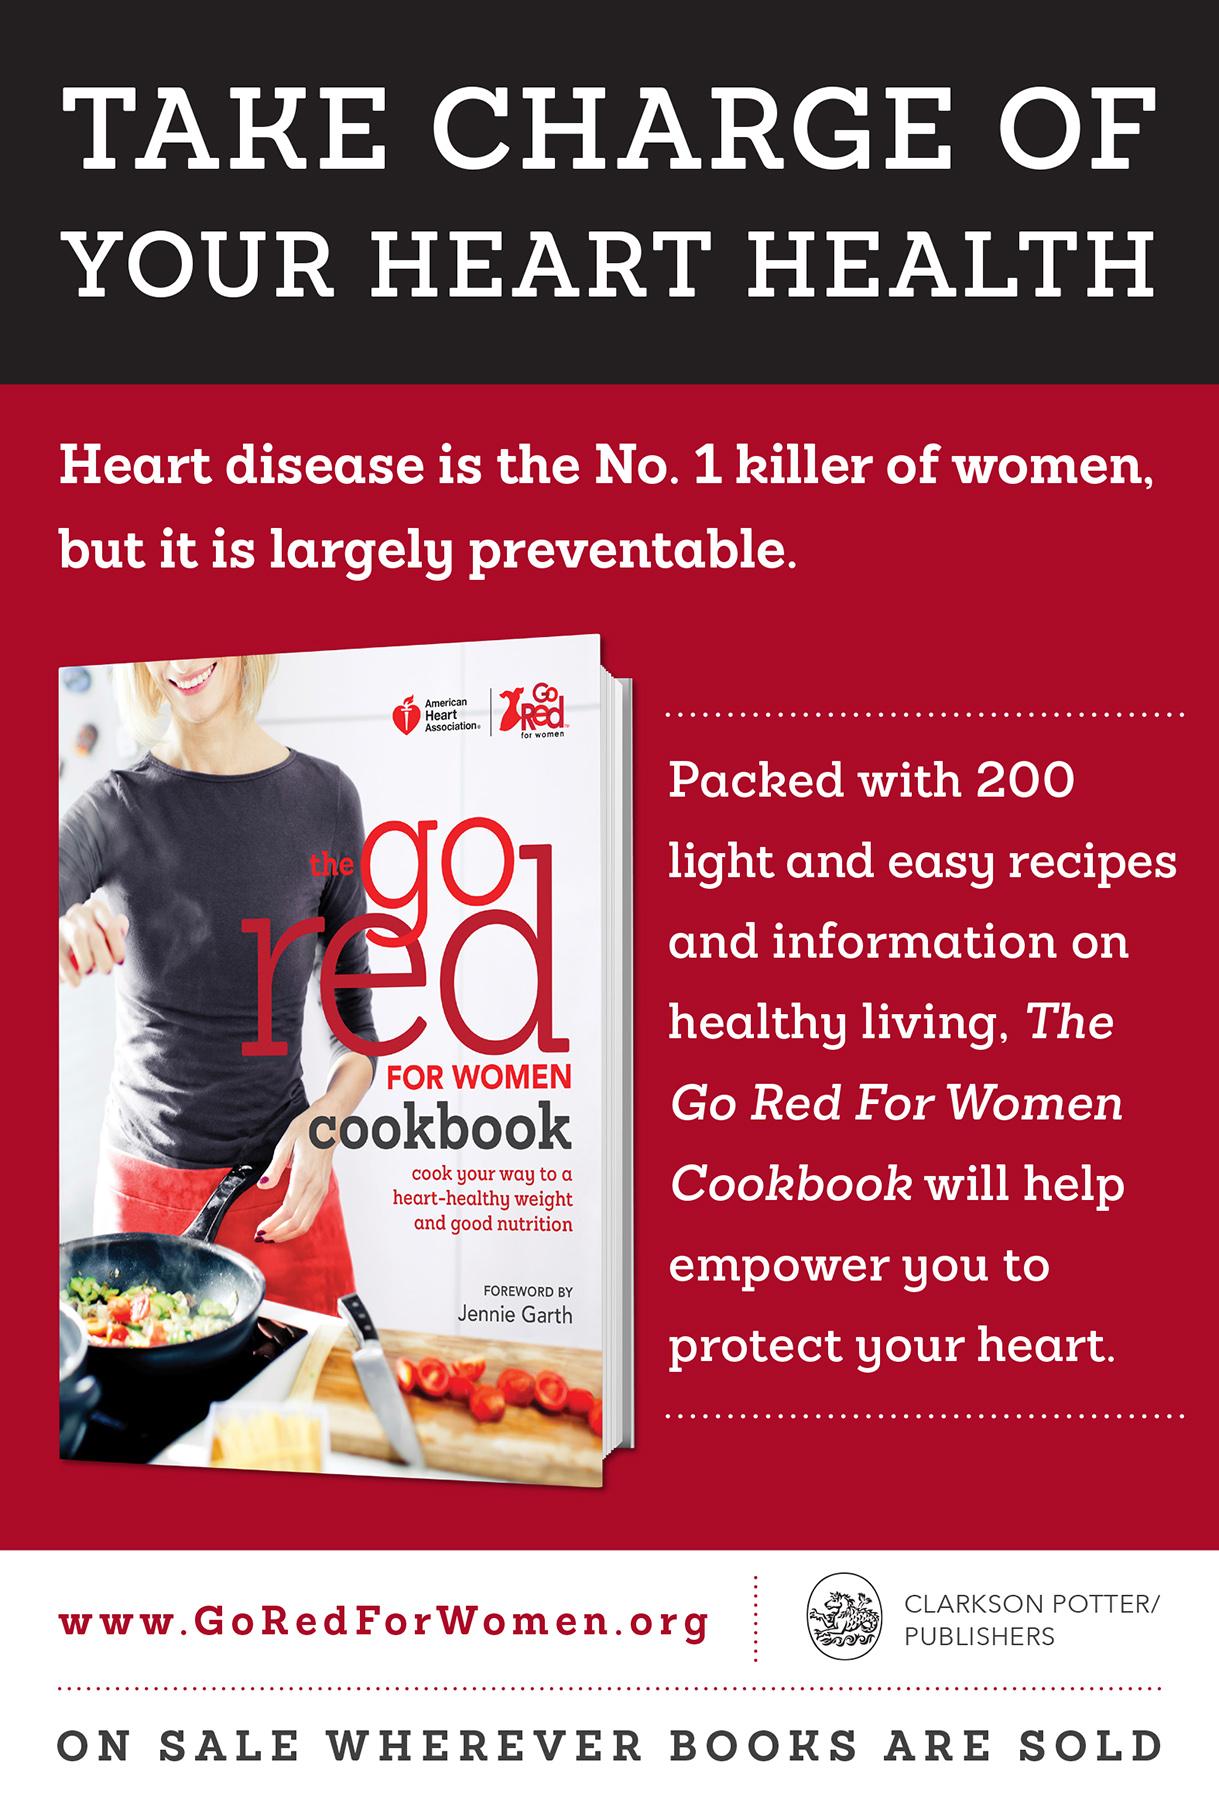 Go Red for Women Cookbook Print Ad for Random House